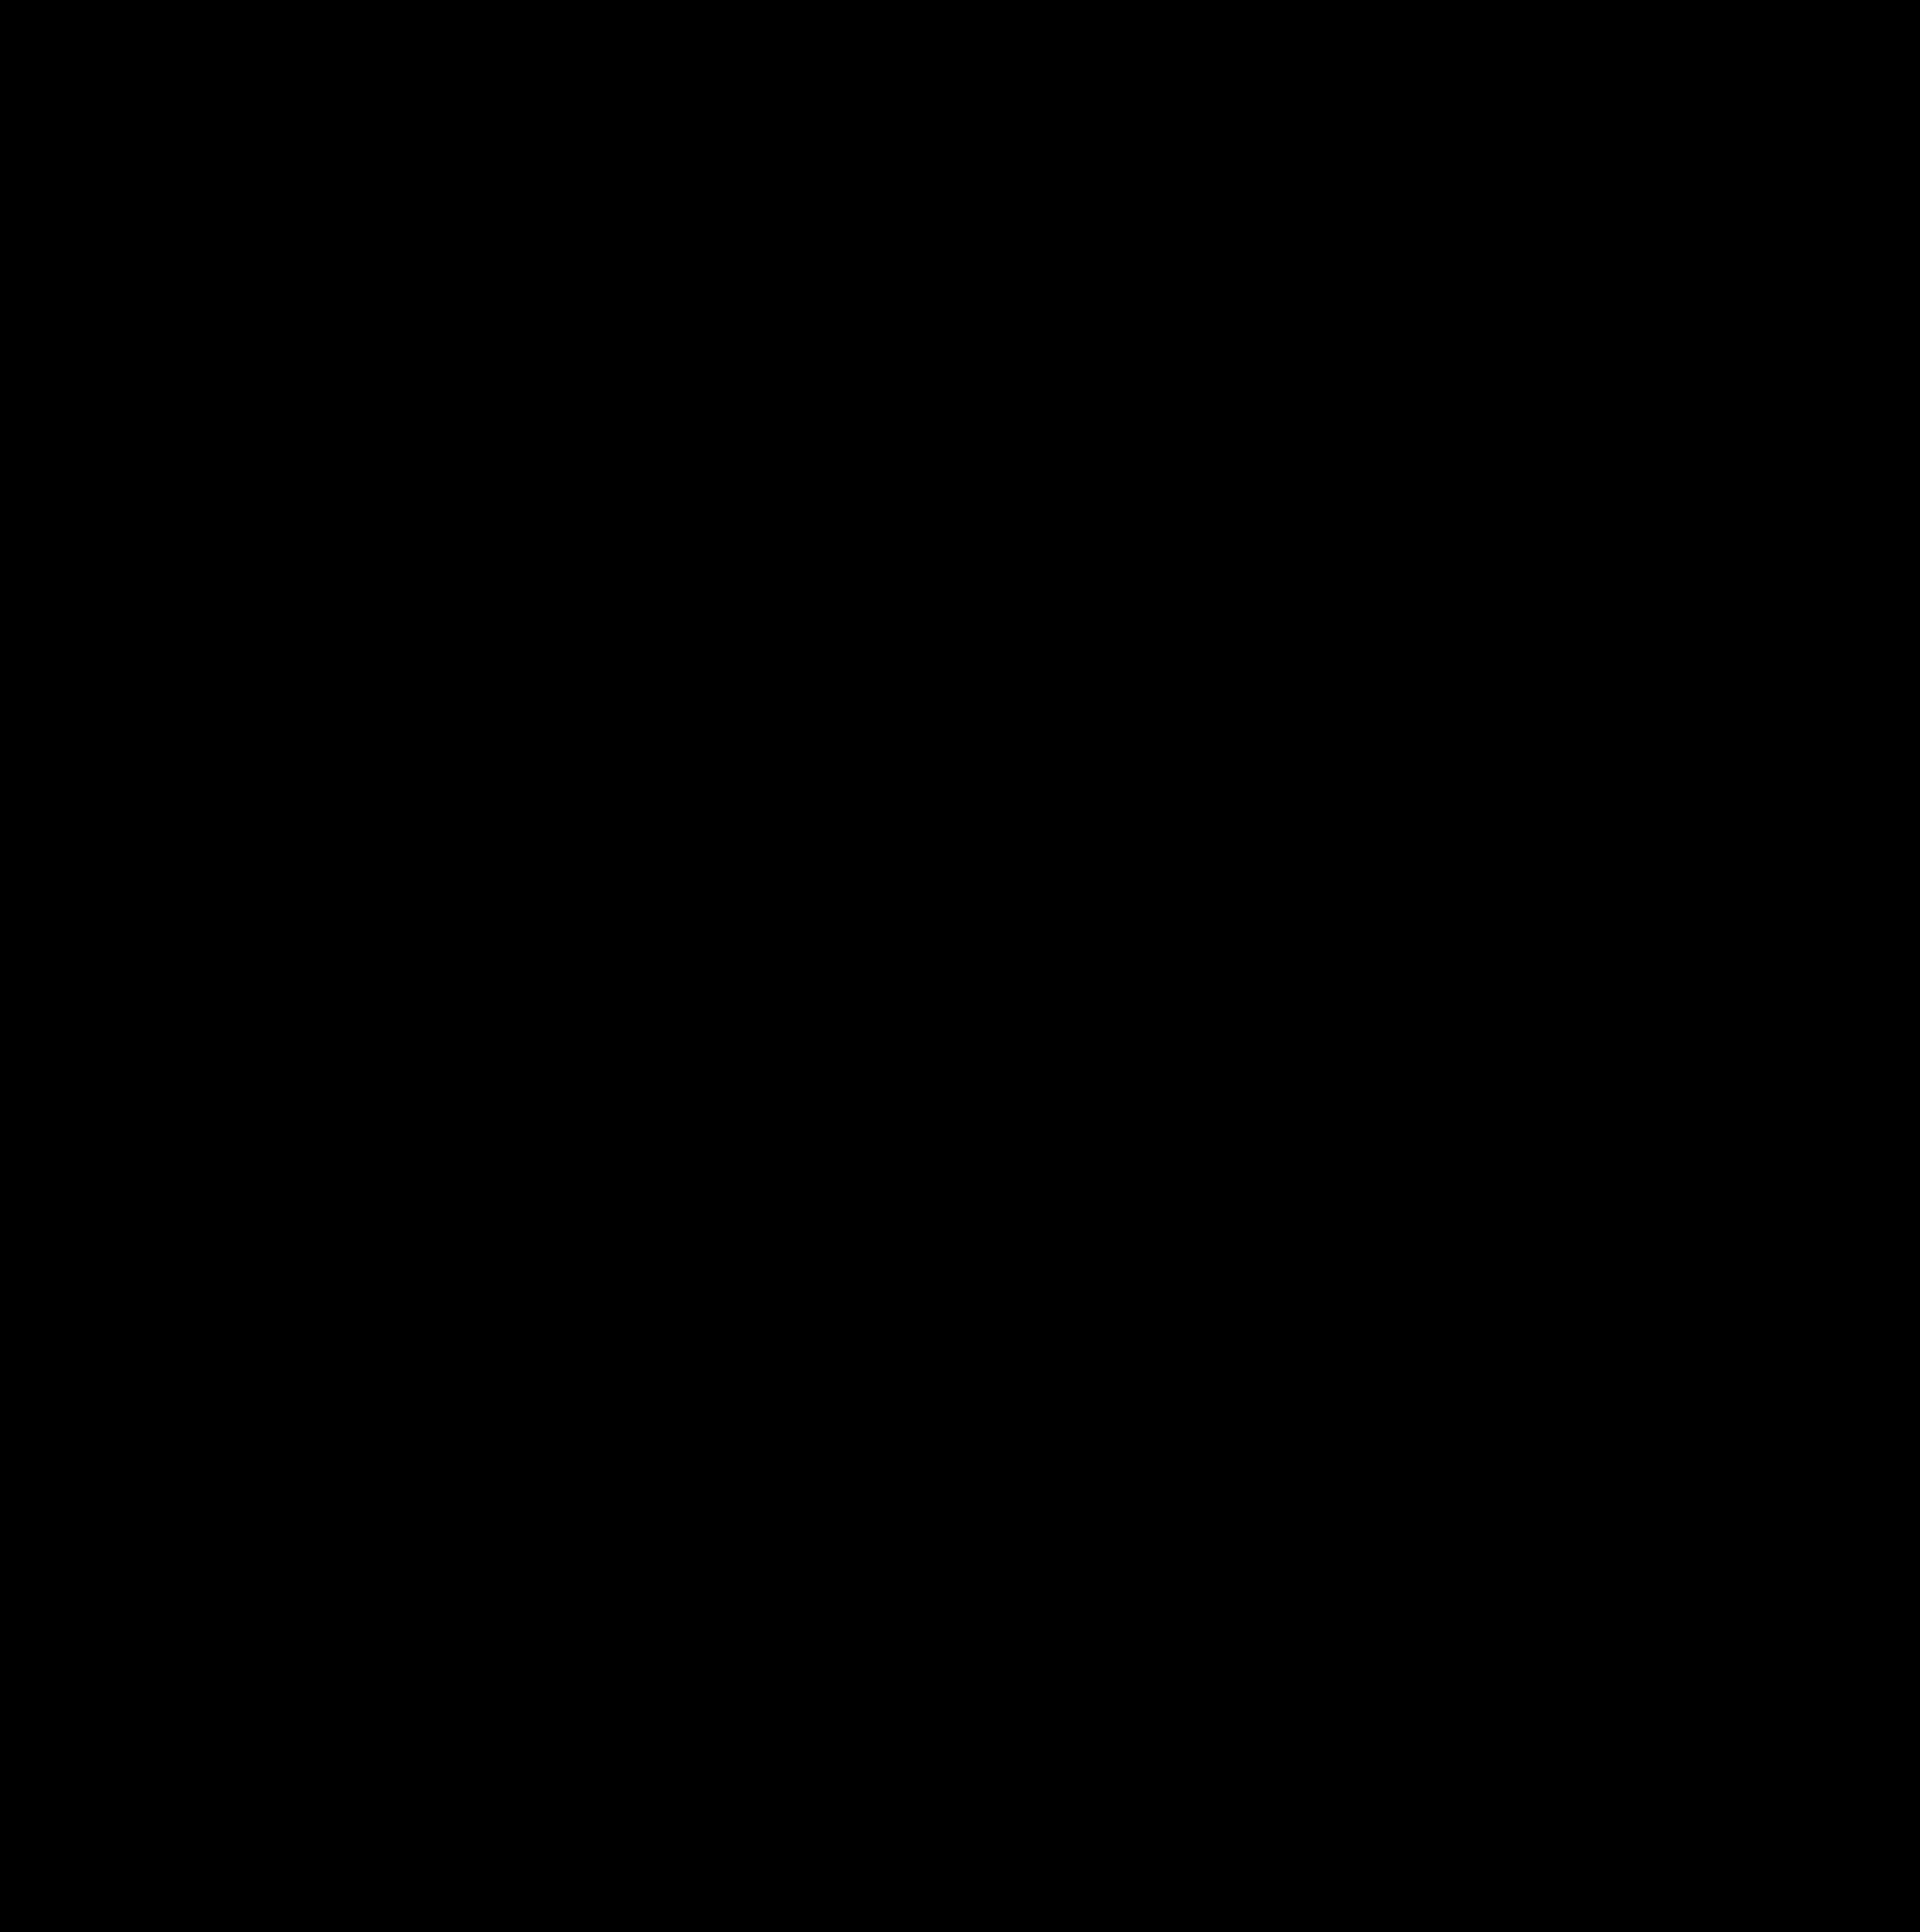 Flower frame clipart black and white vector Clipart - Floral Frame vector